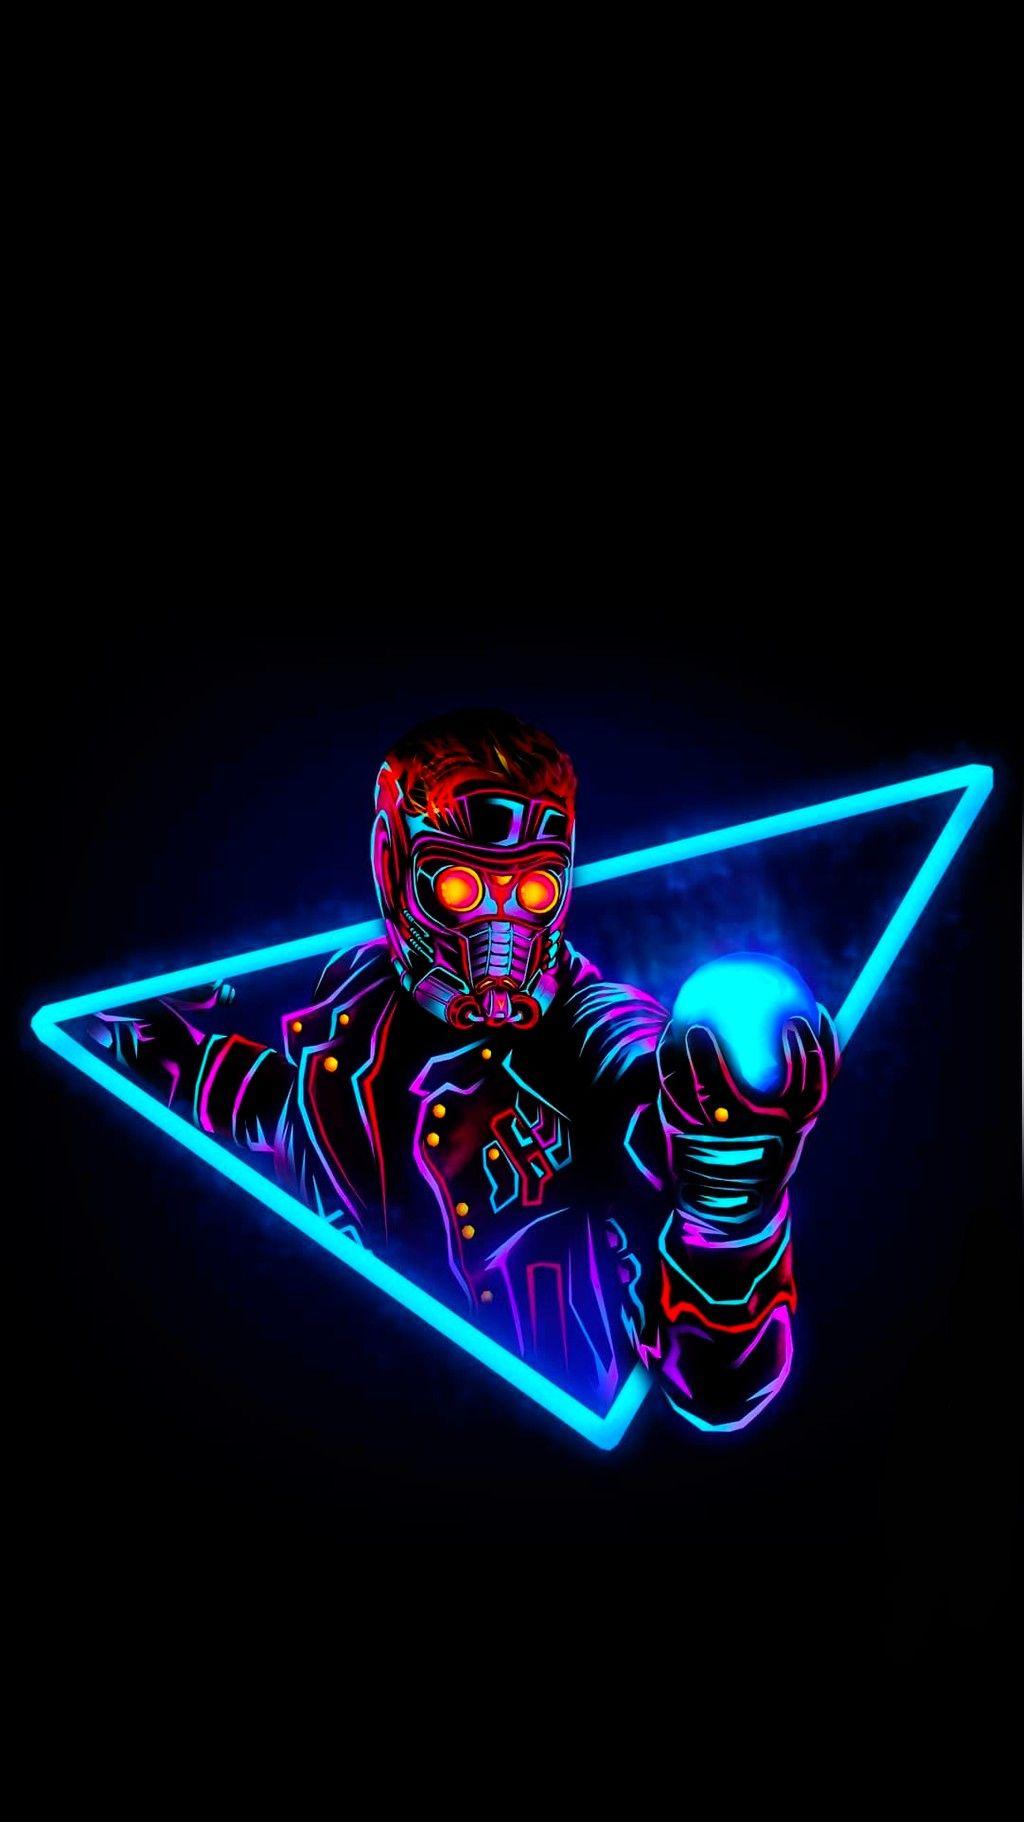 Marvel Neon Wallpaper 4k , HD Wallpaper & Backgrounds